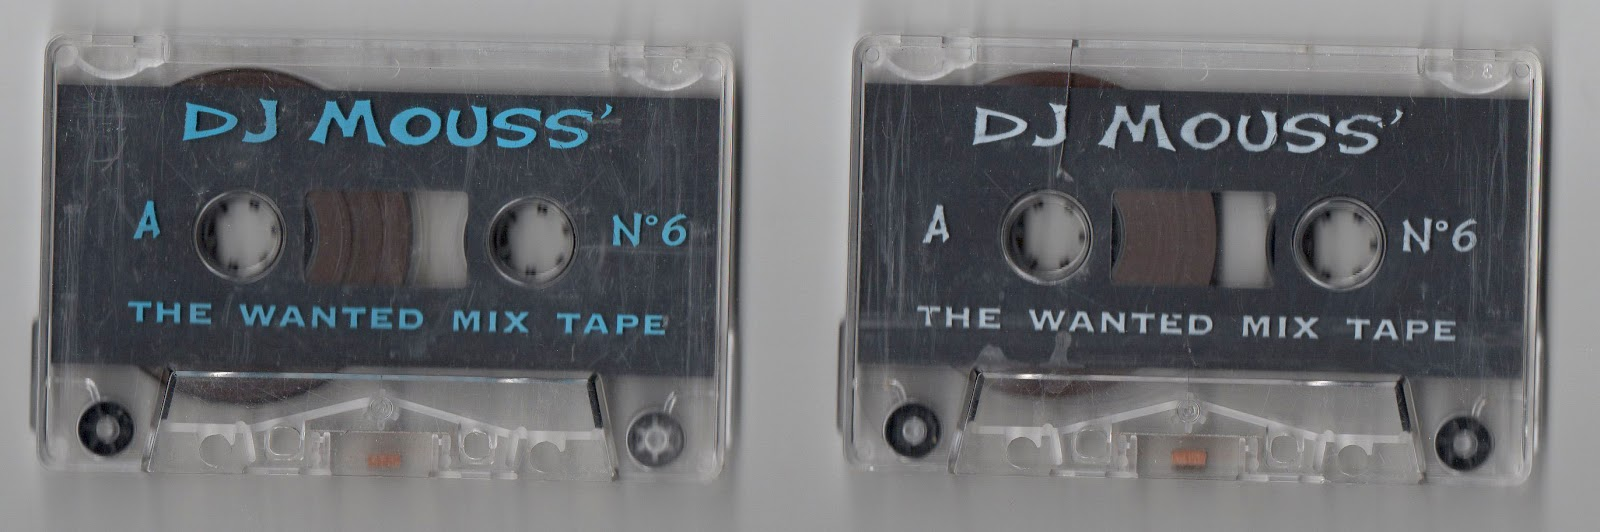 Full-labs: dj mouss wanted rnb vol. 10.